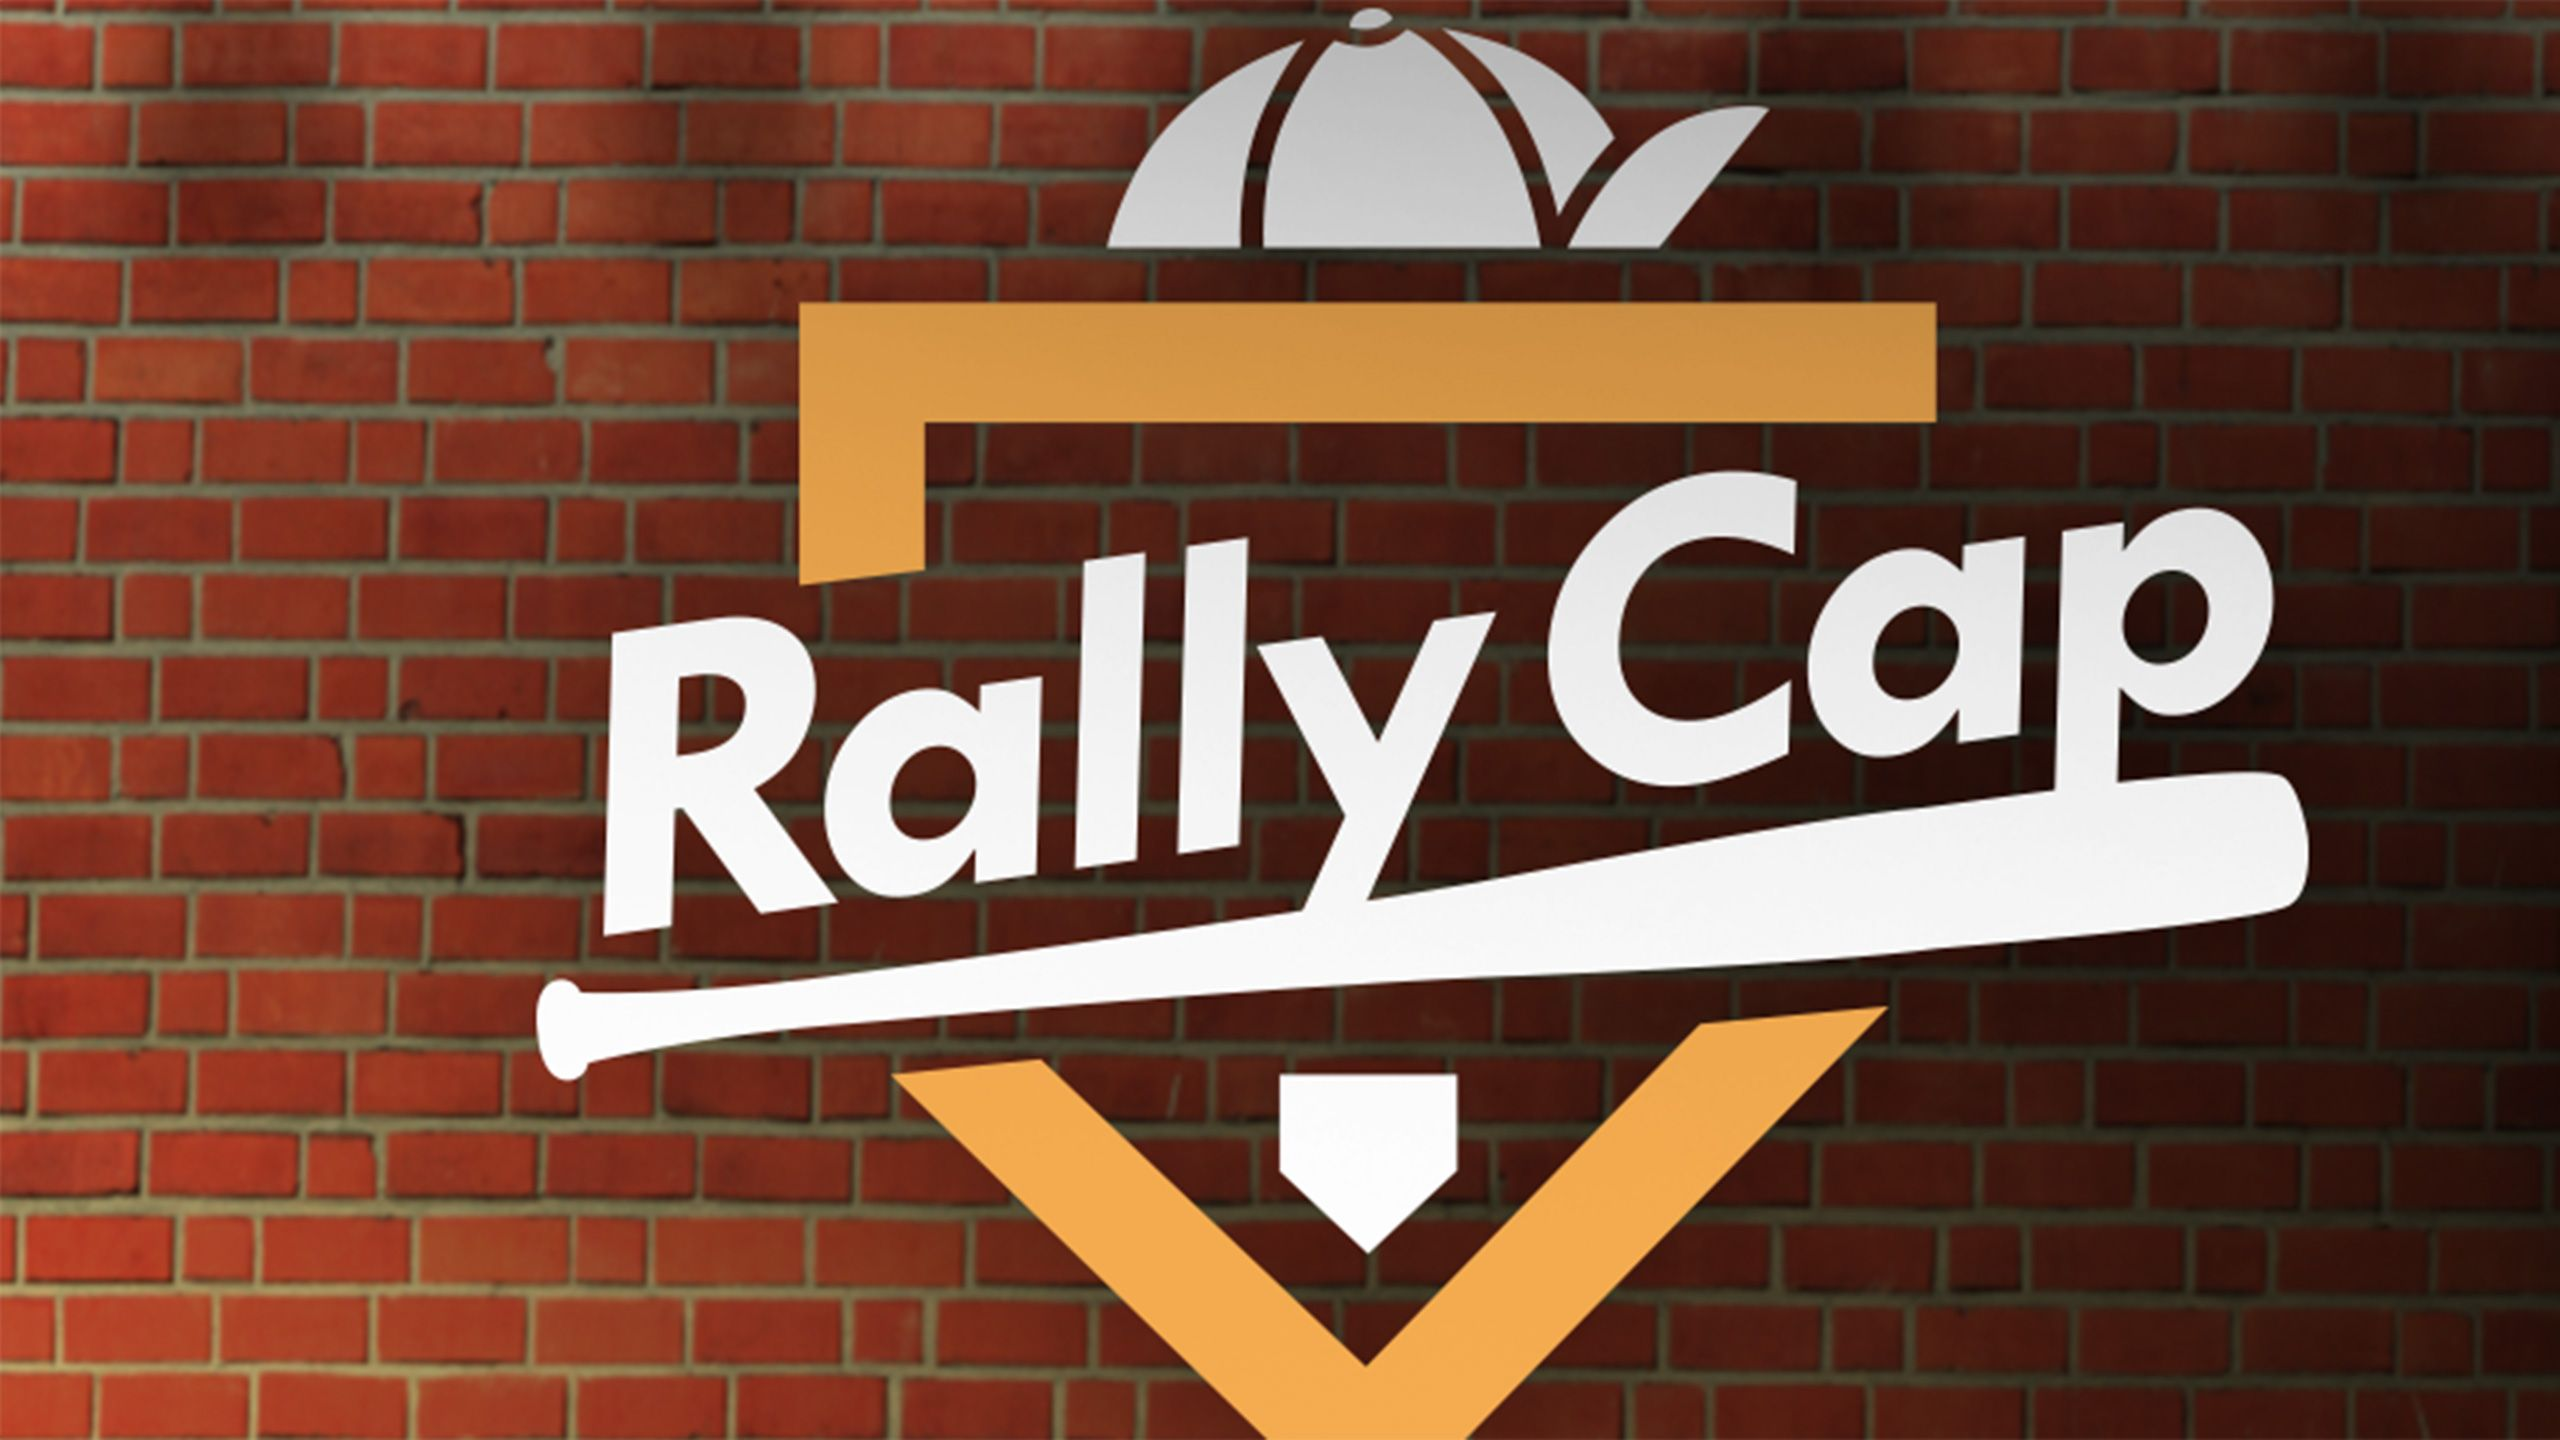 Sun, 5/27 - Rally Cap